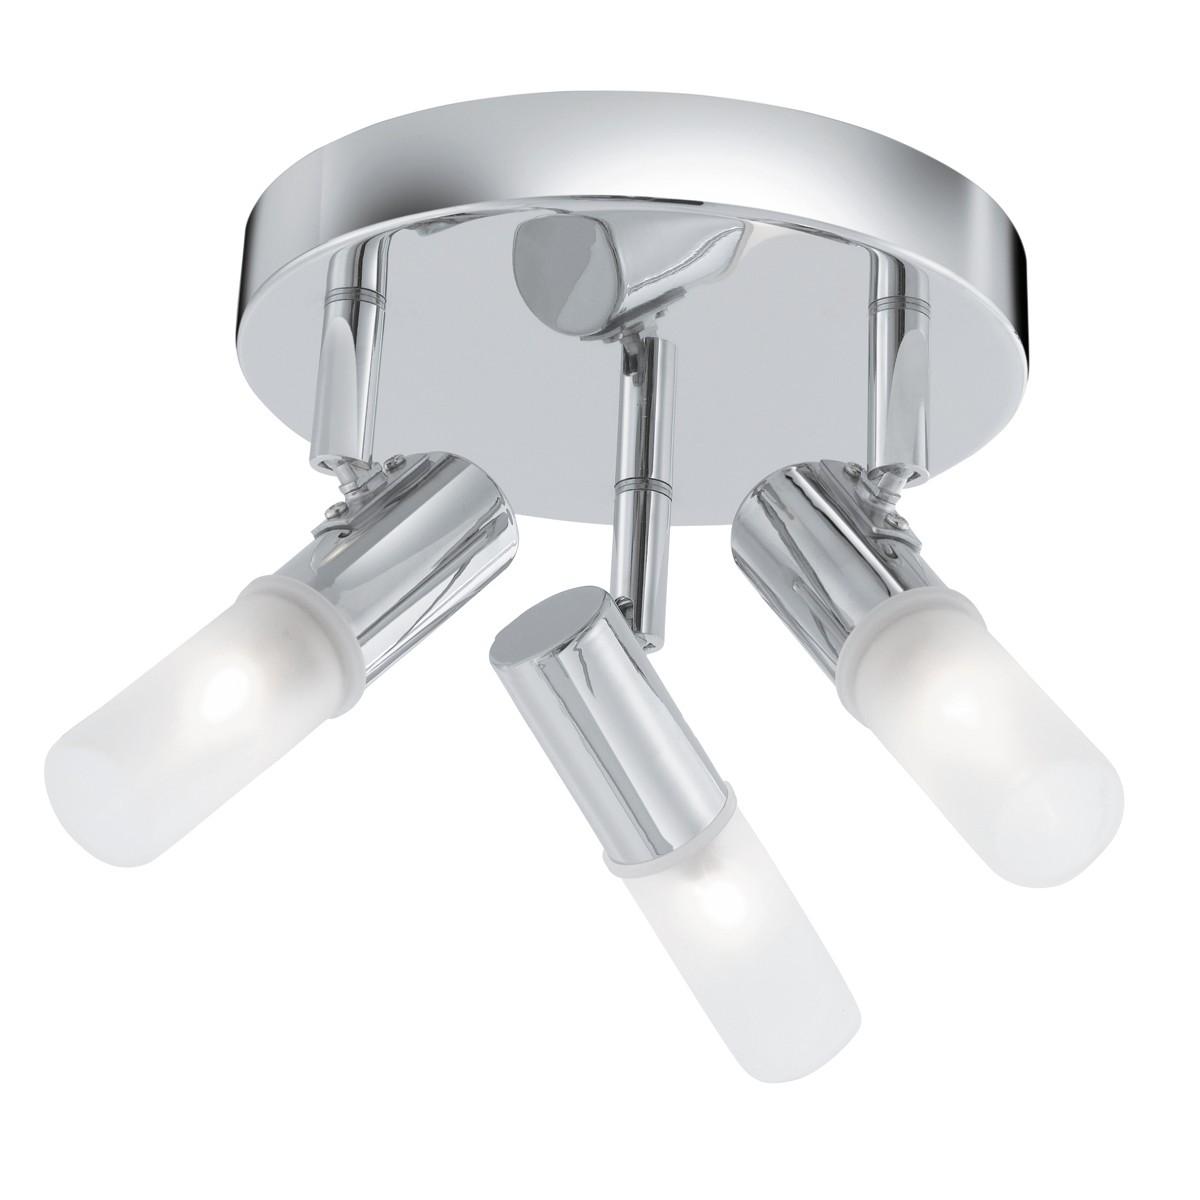 Ribbed Glass Diffuser 212031RT Rustic Capital Lighting Reid 3 Light Ceiling